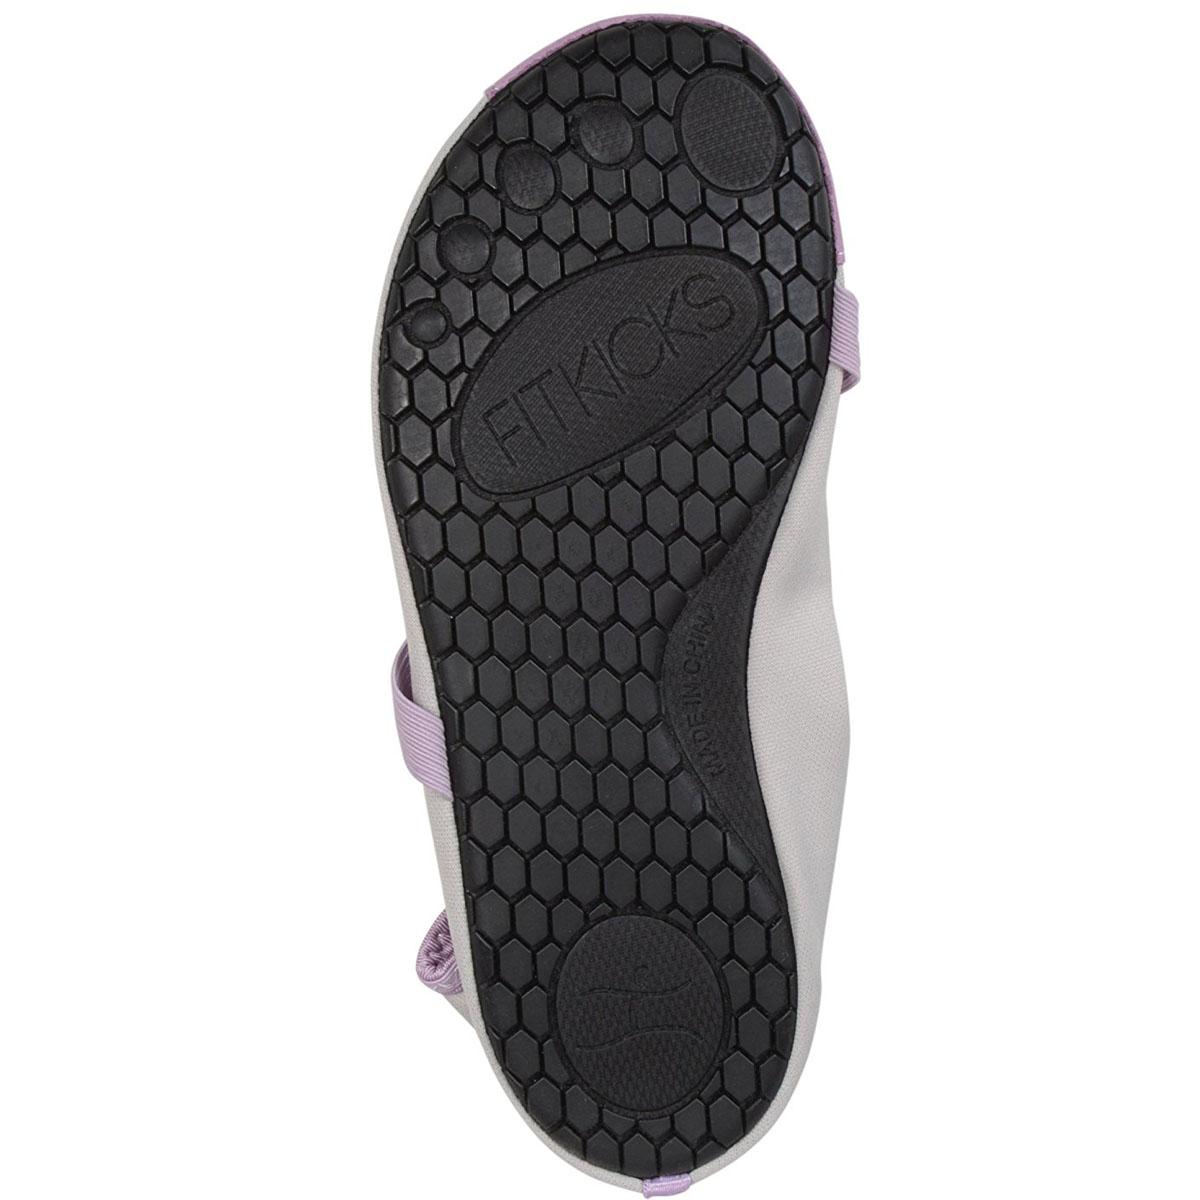 FitKicks-Women-039-s-Non-Slip-Sole-Active-Footwear thumbnail 29